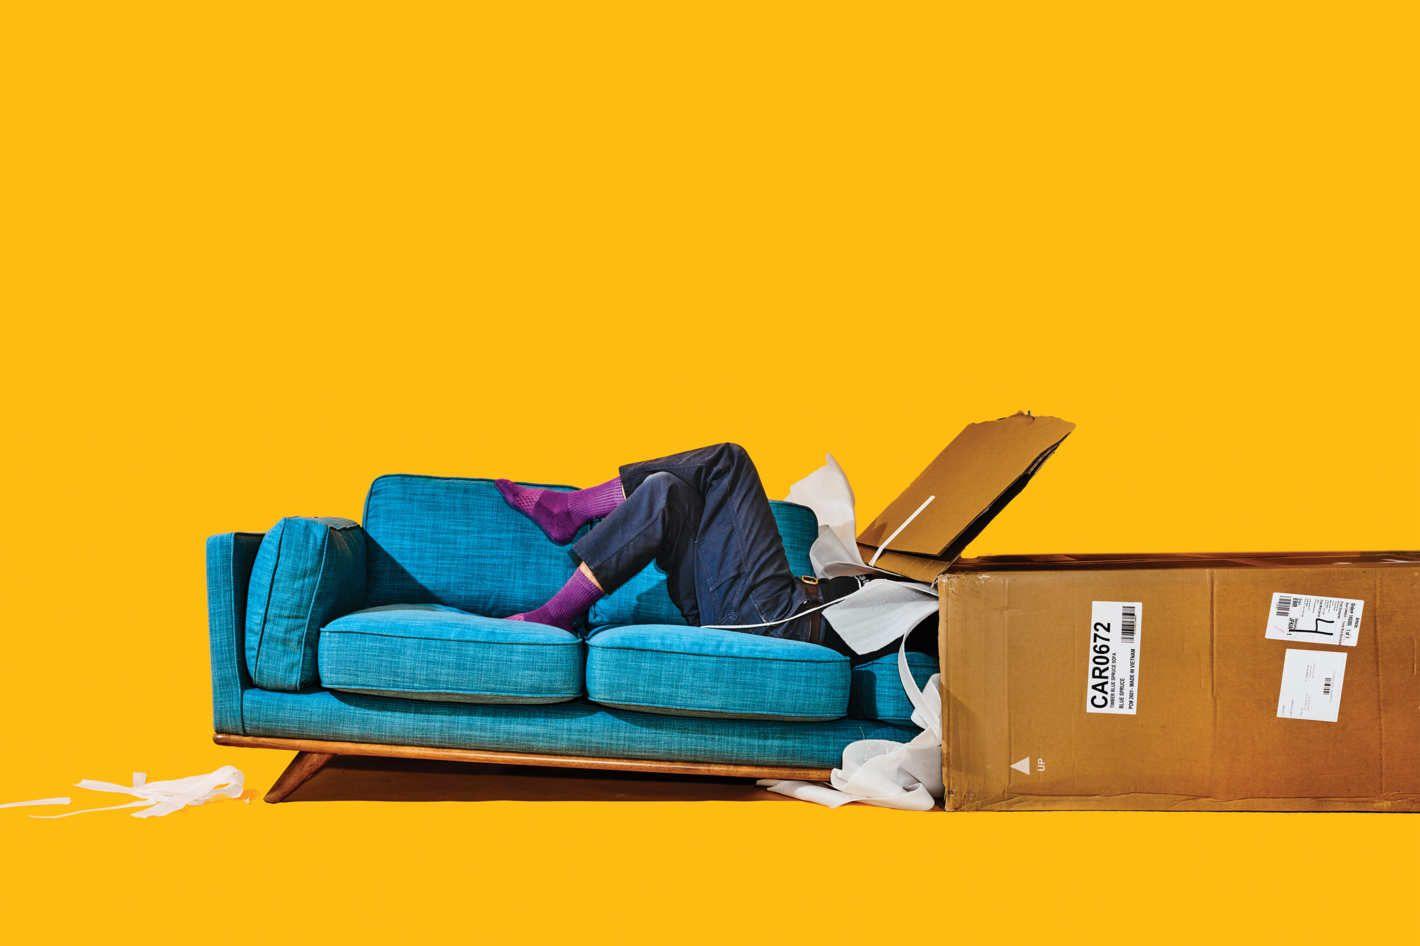 Wondrous Burrow Sofa Sofa Couch Best Flats Machost Co Dining Chair Design Ideas Machostcouk